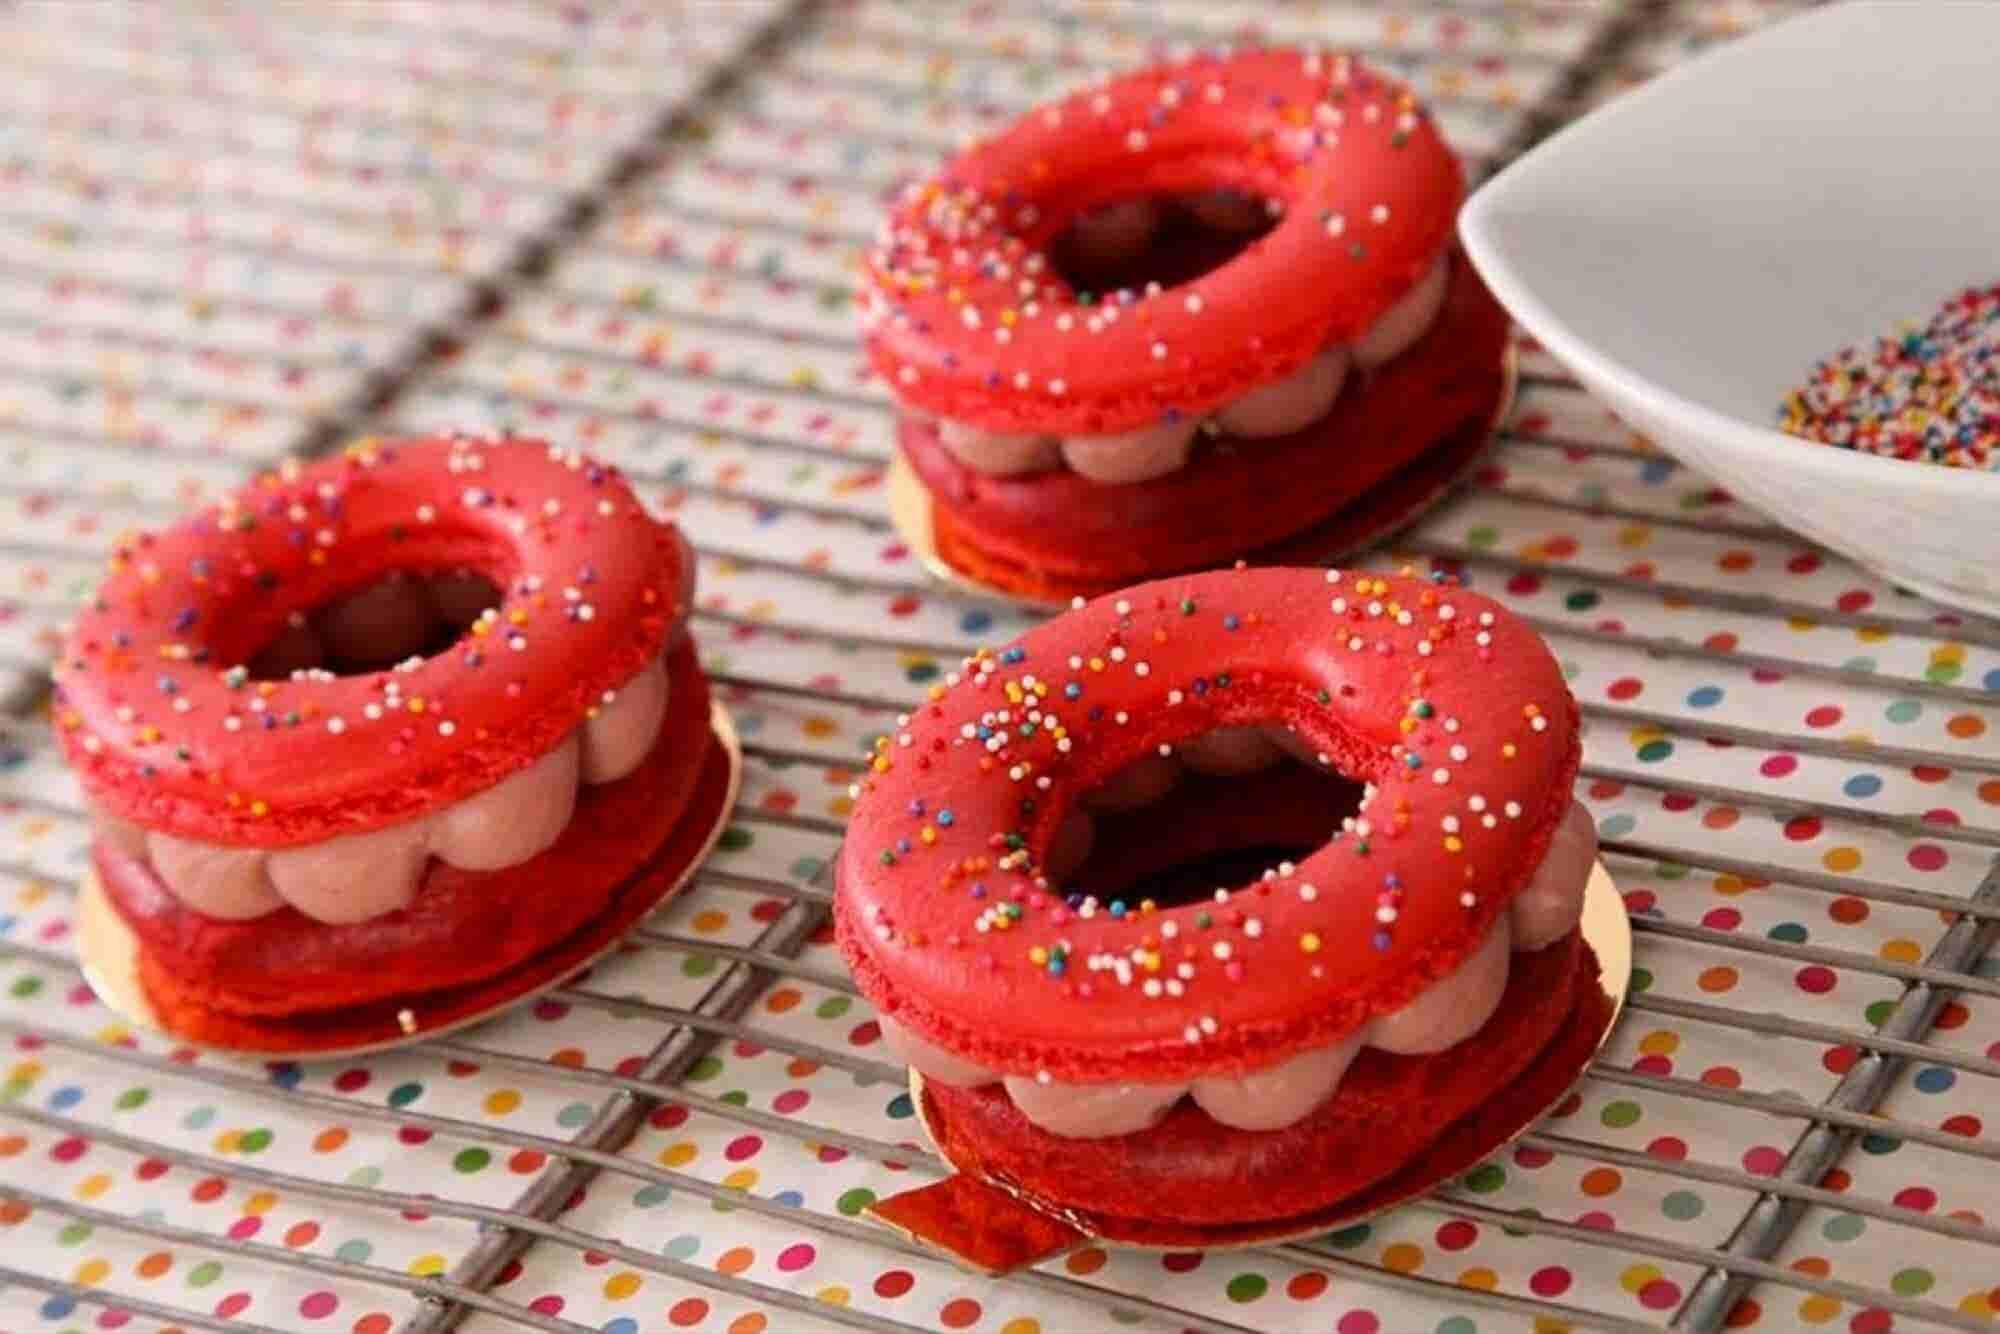 Check Out the 'Macaronut,' the Macaron-Doughnut Mashup